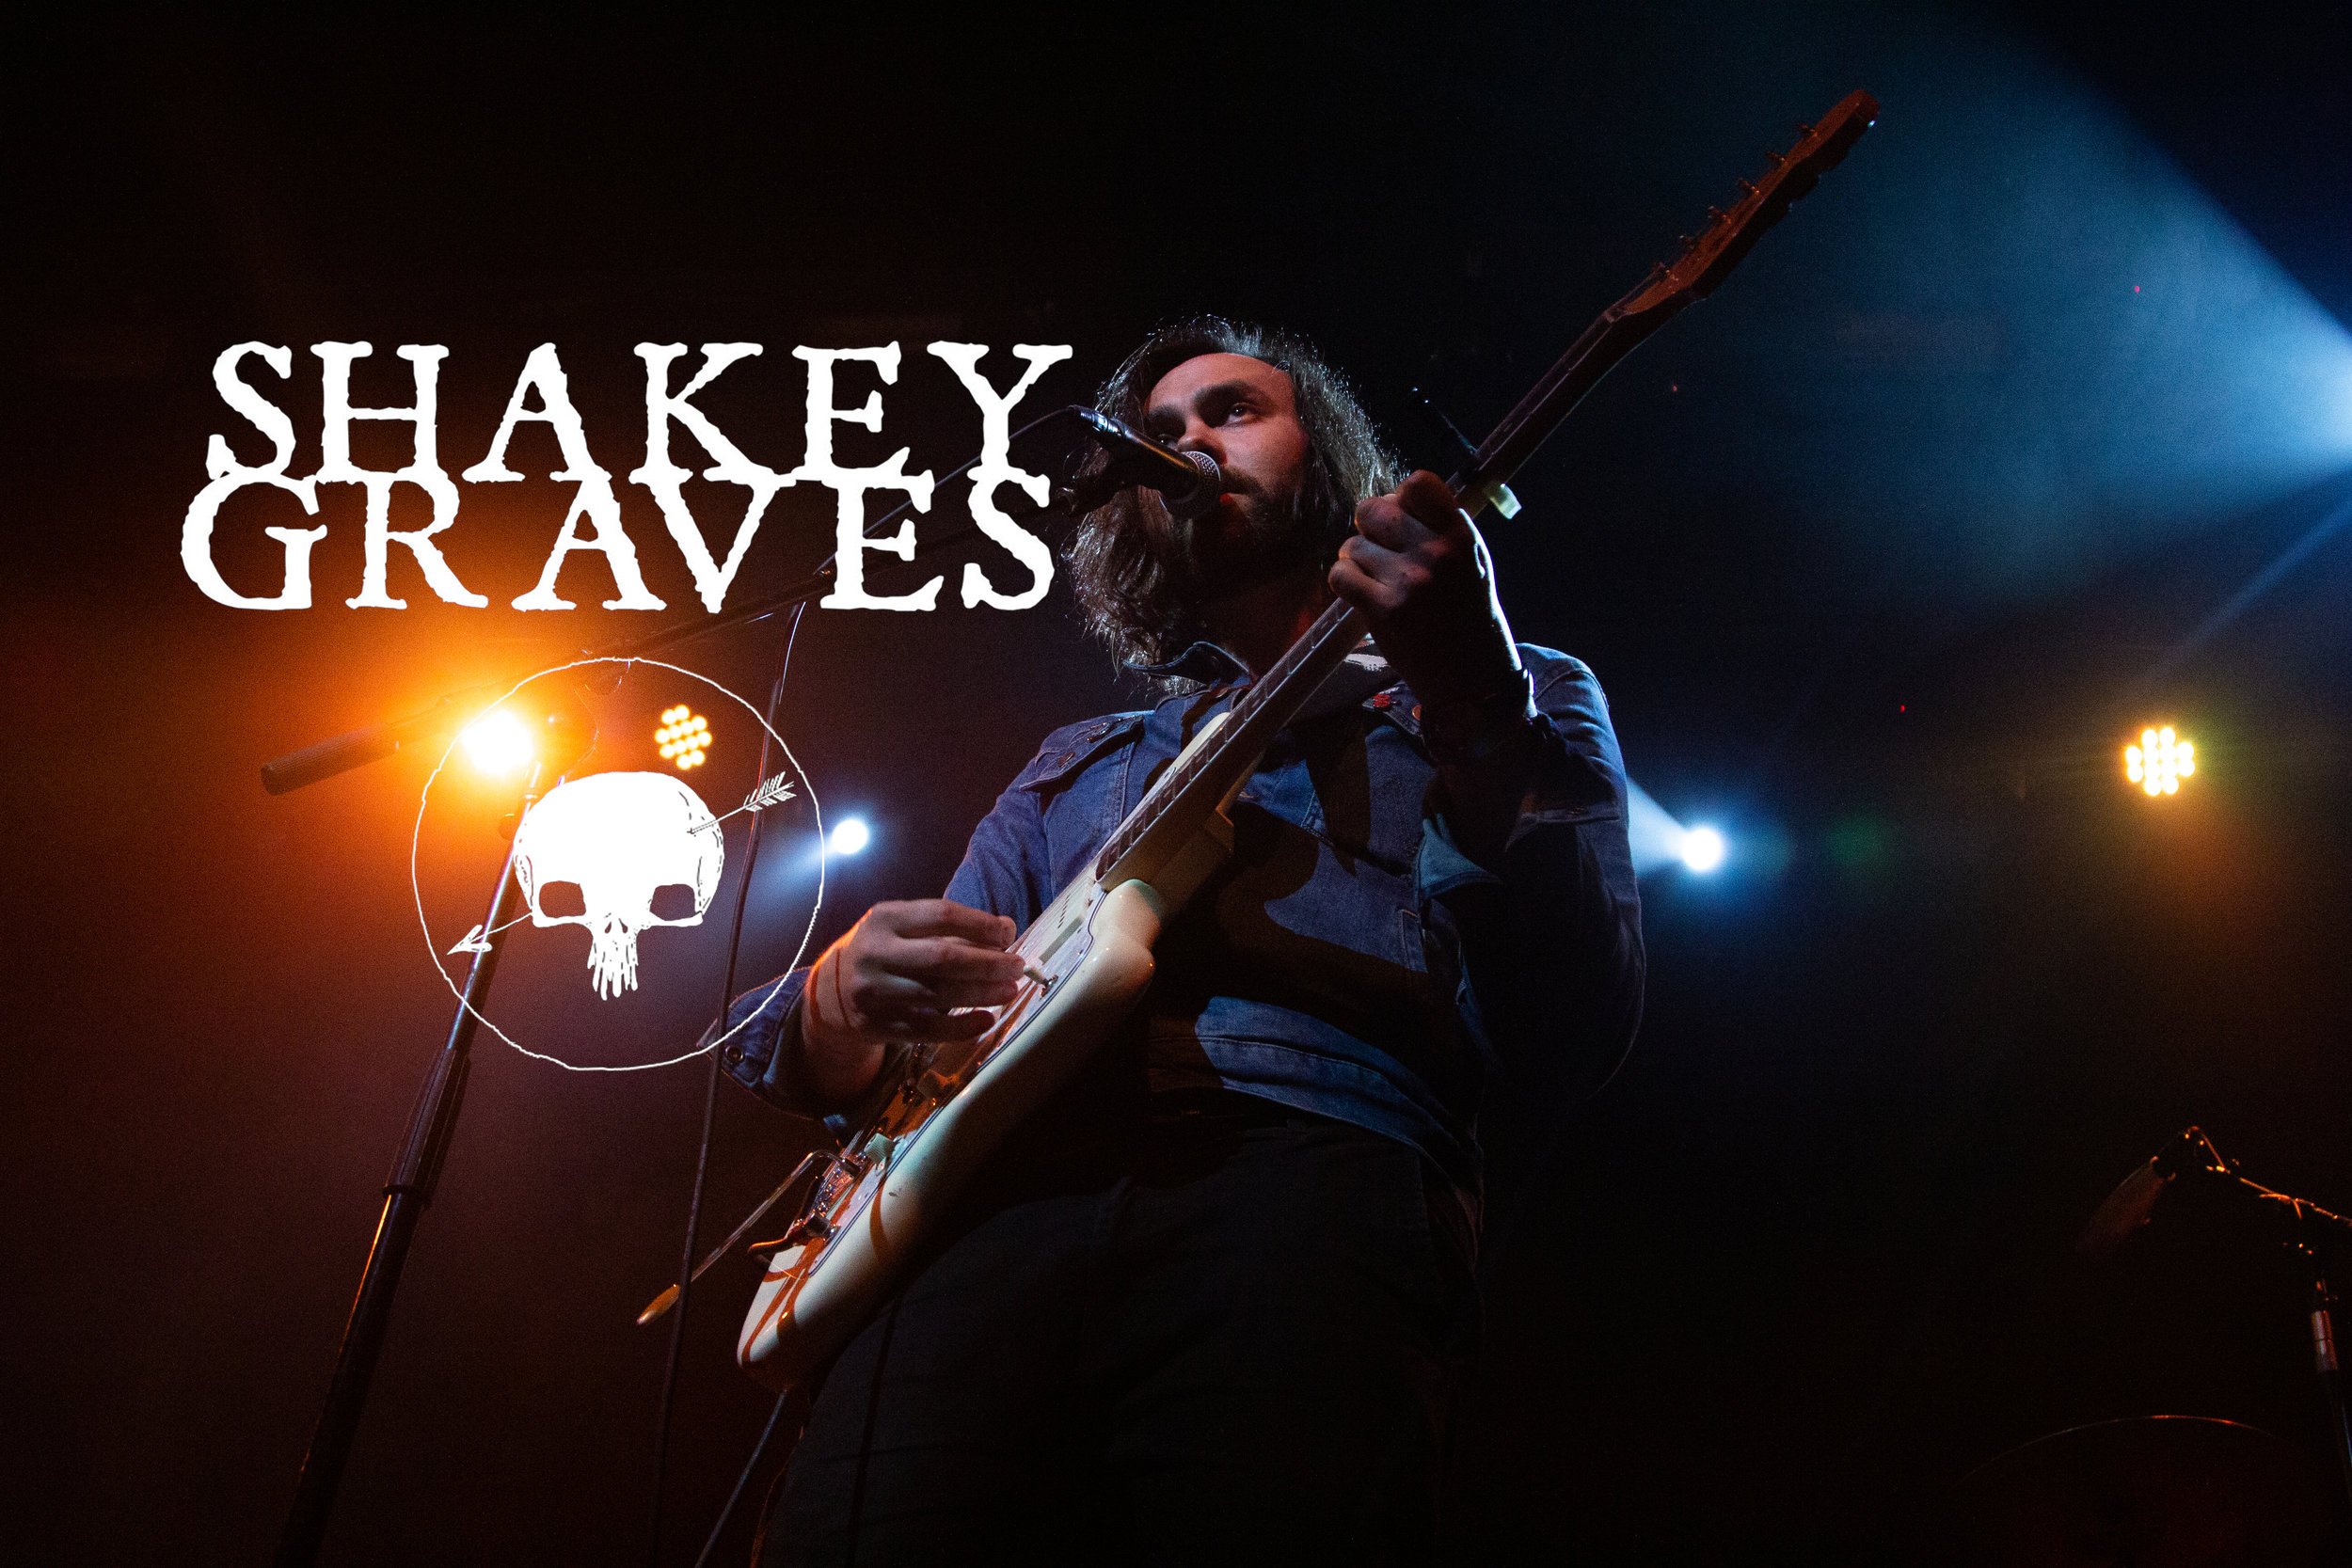 Shakey-Graves-title.jpg